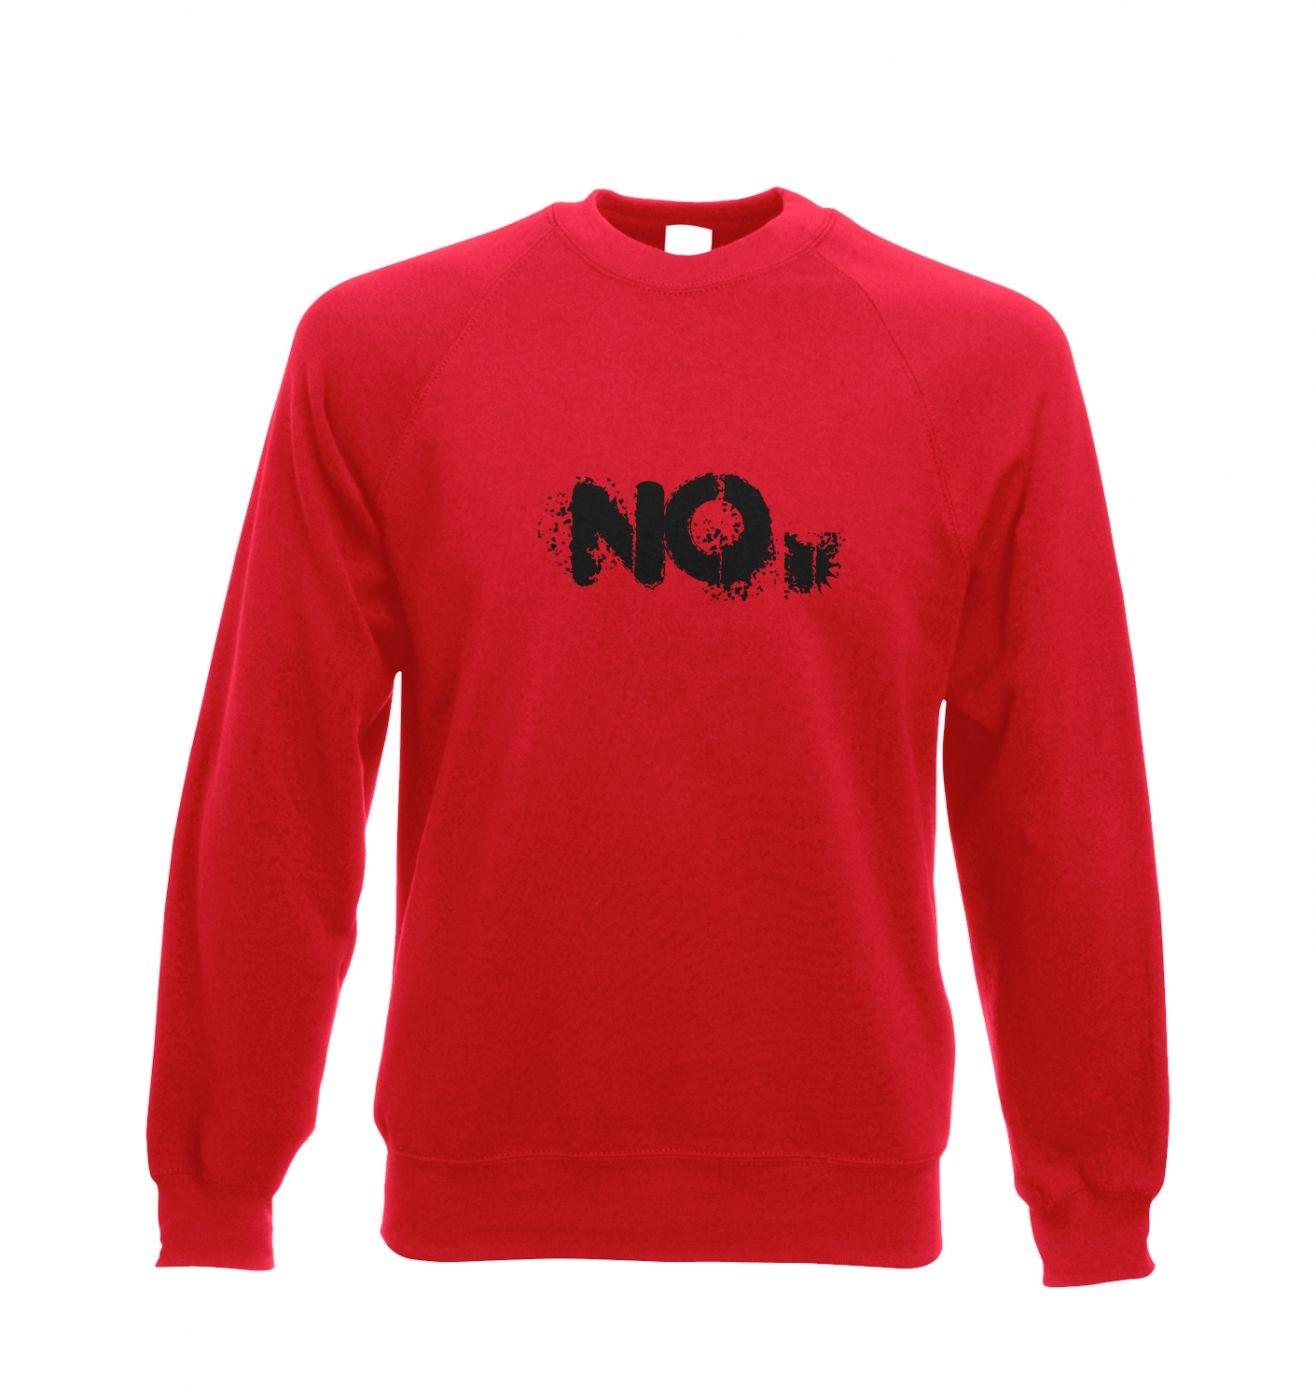 NO Adult crewneck sweatshirt